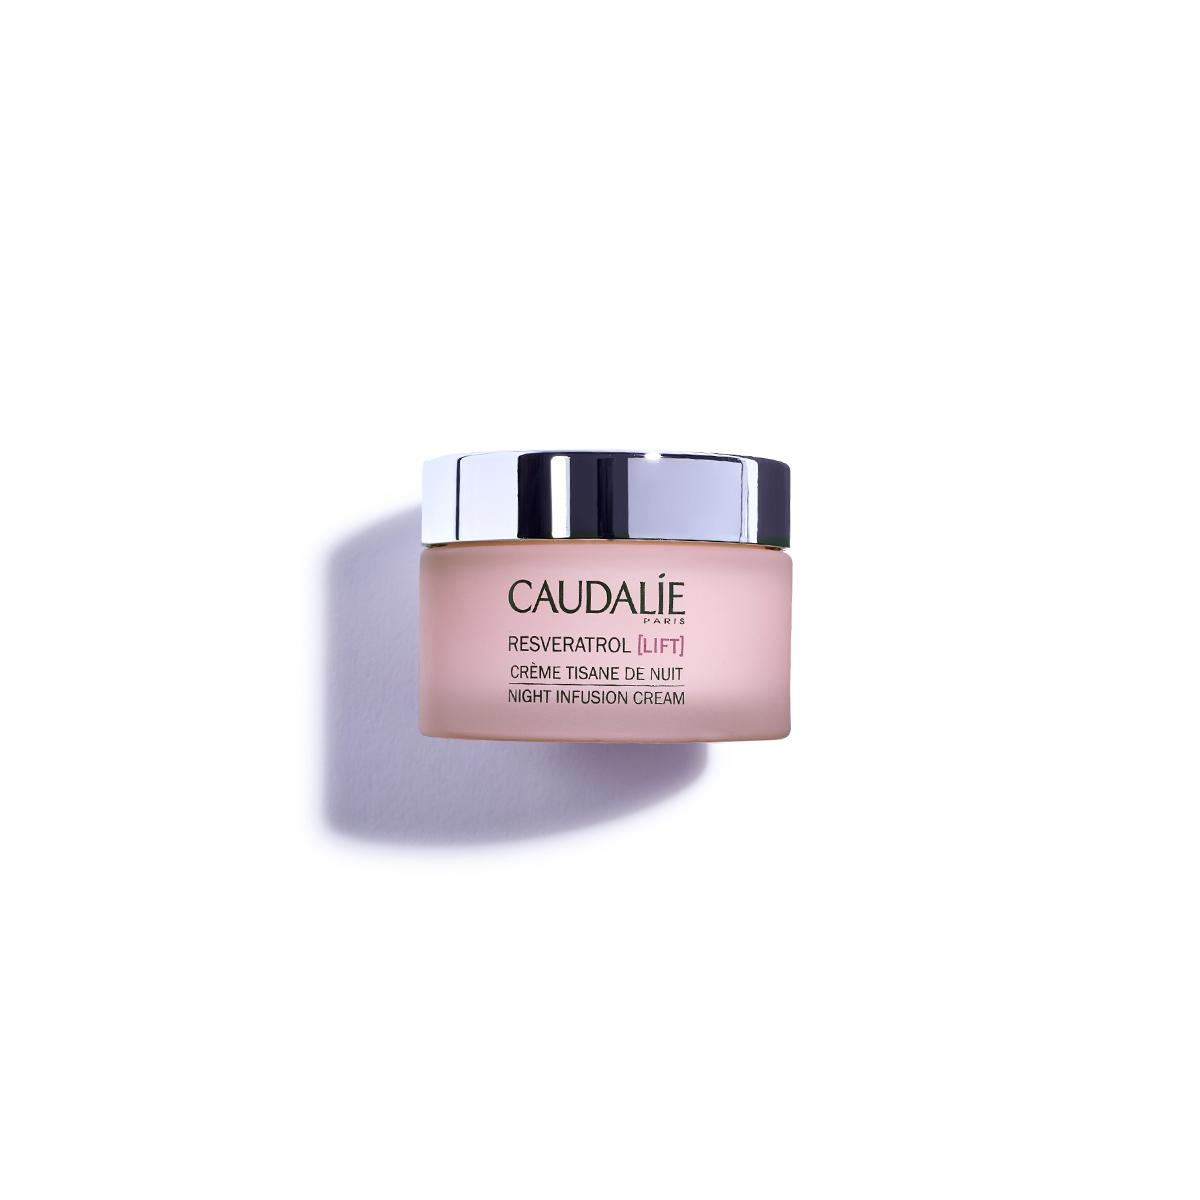 Resveratrol [Lift] Night Infusion Cream